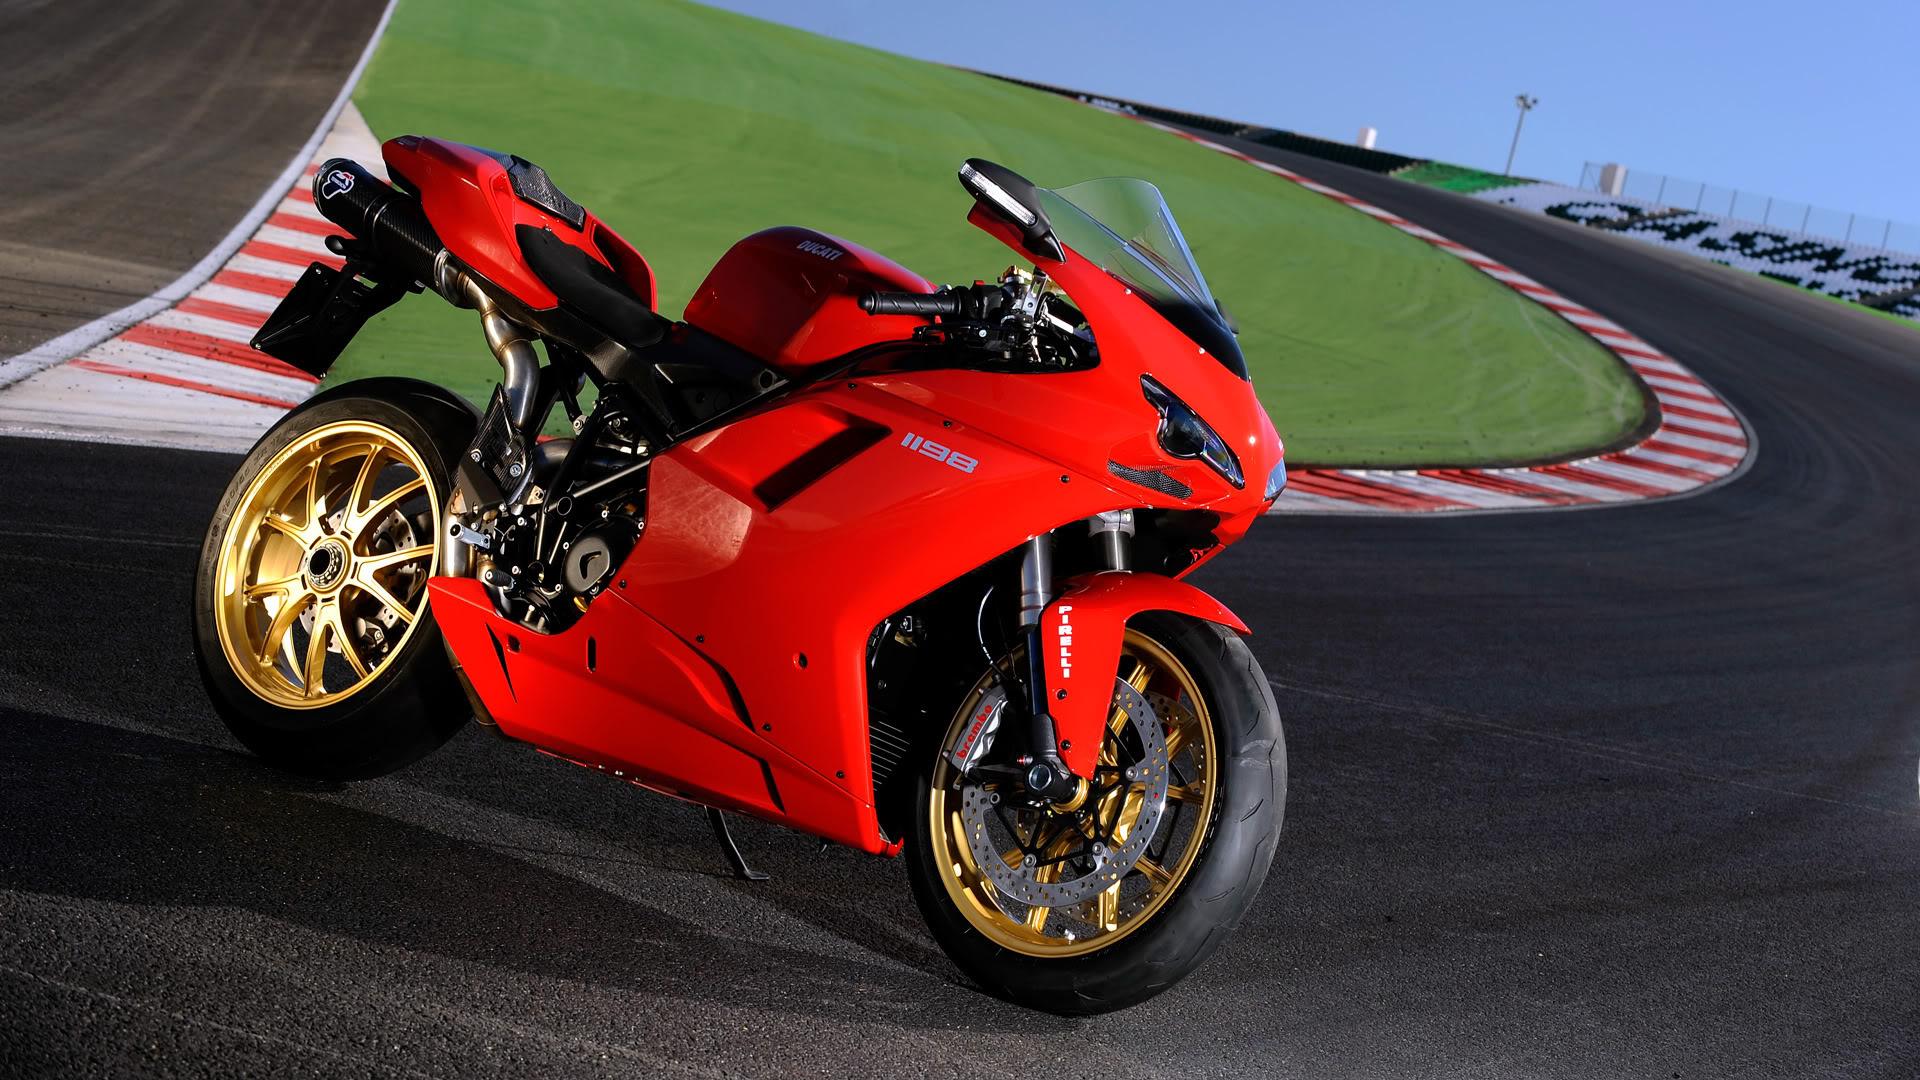 15 Outstanding HD Ducati Wallpapers - Stunning HD ...